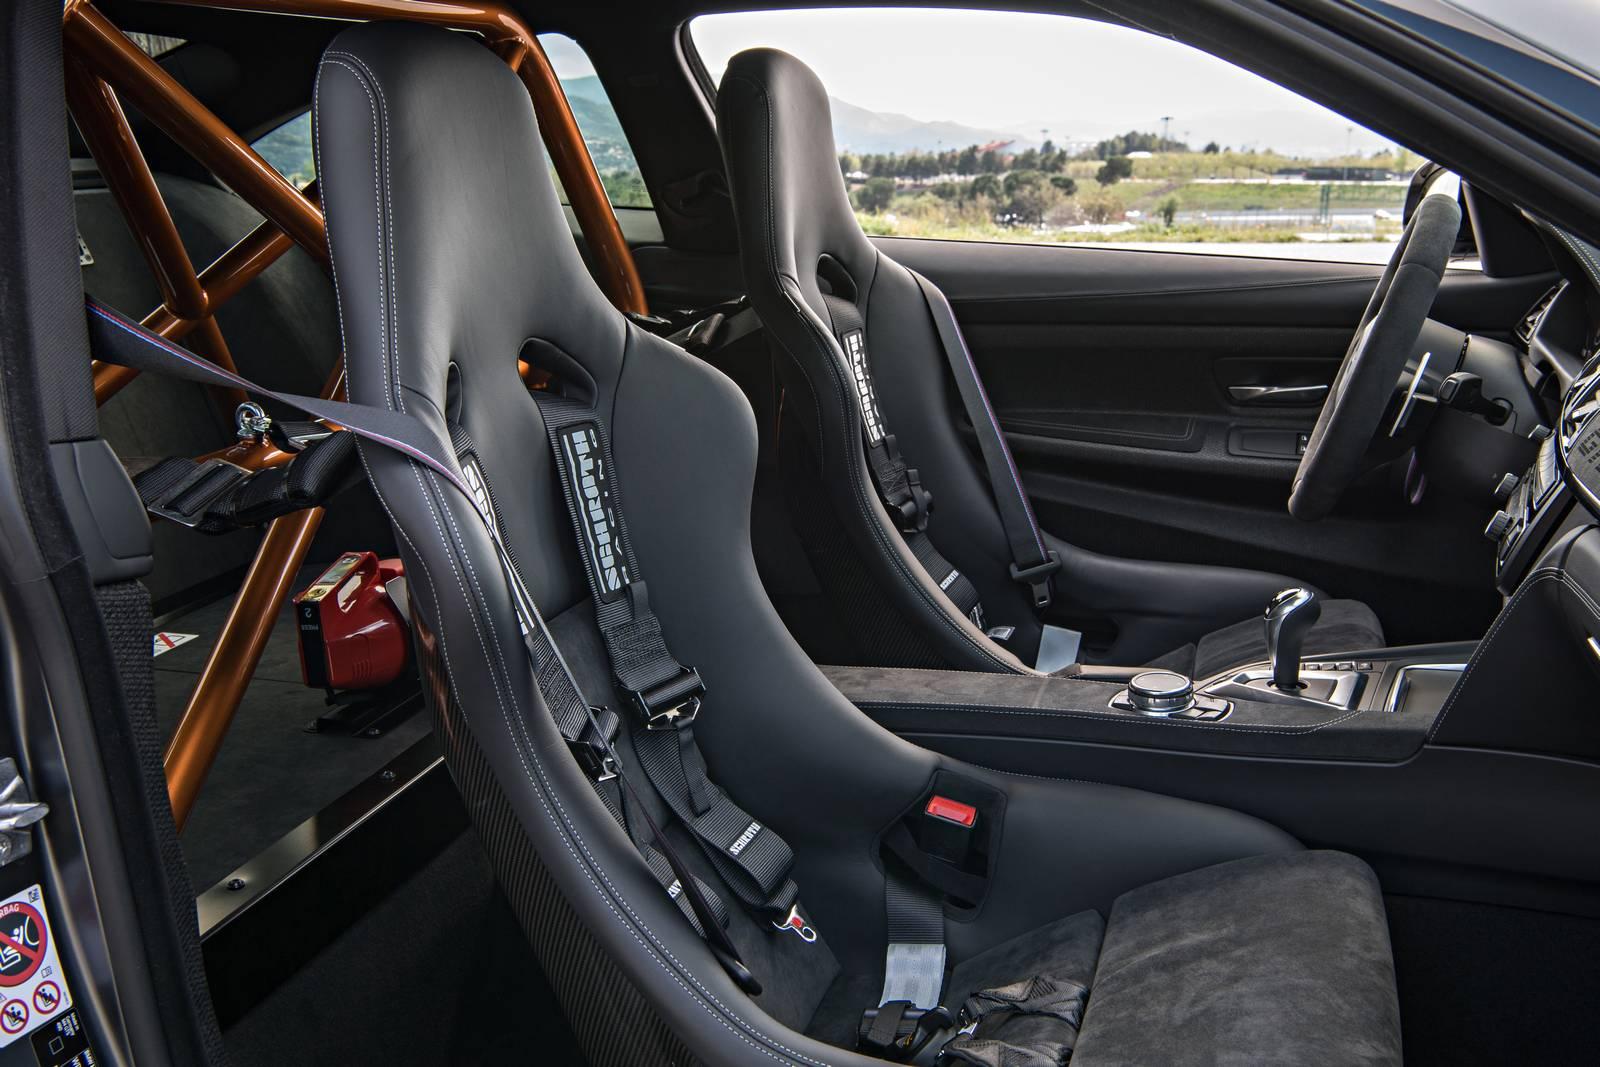 Bmw M4 Gts For Sale >> 2016 BMW M4 GTS Review - GTspirit